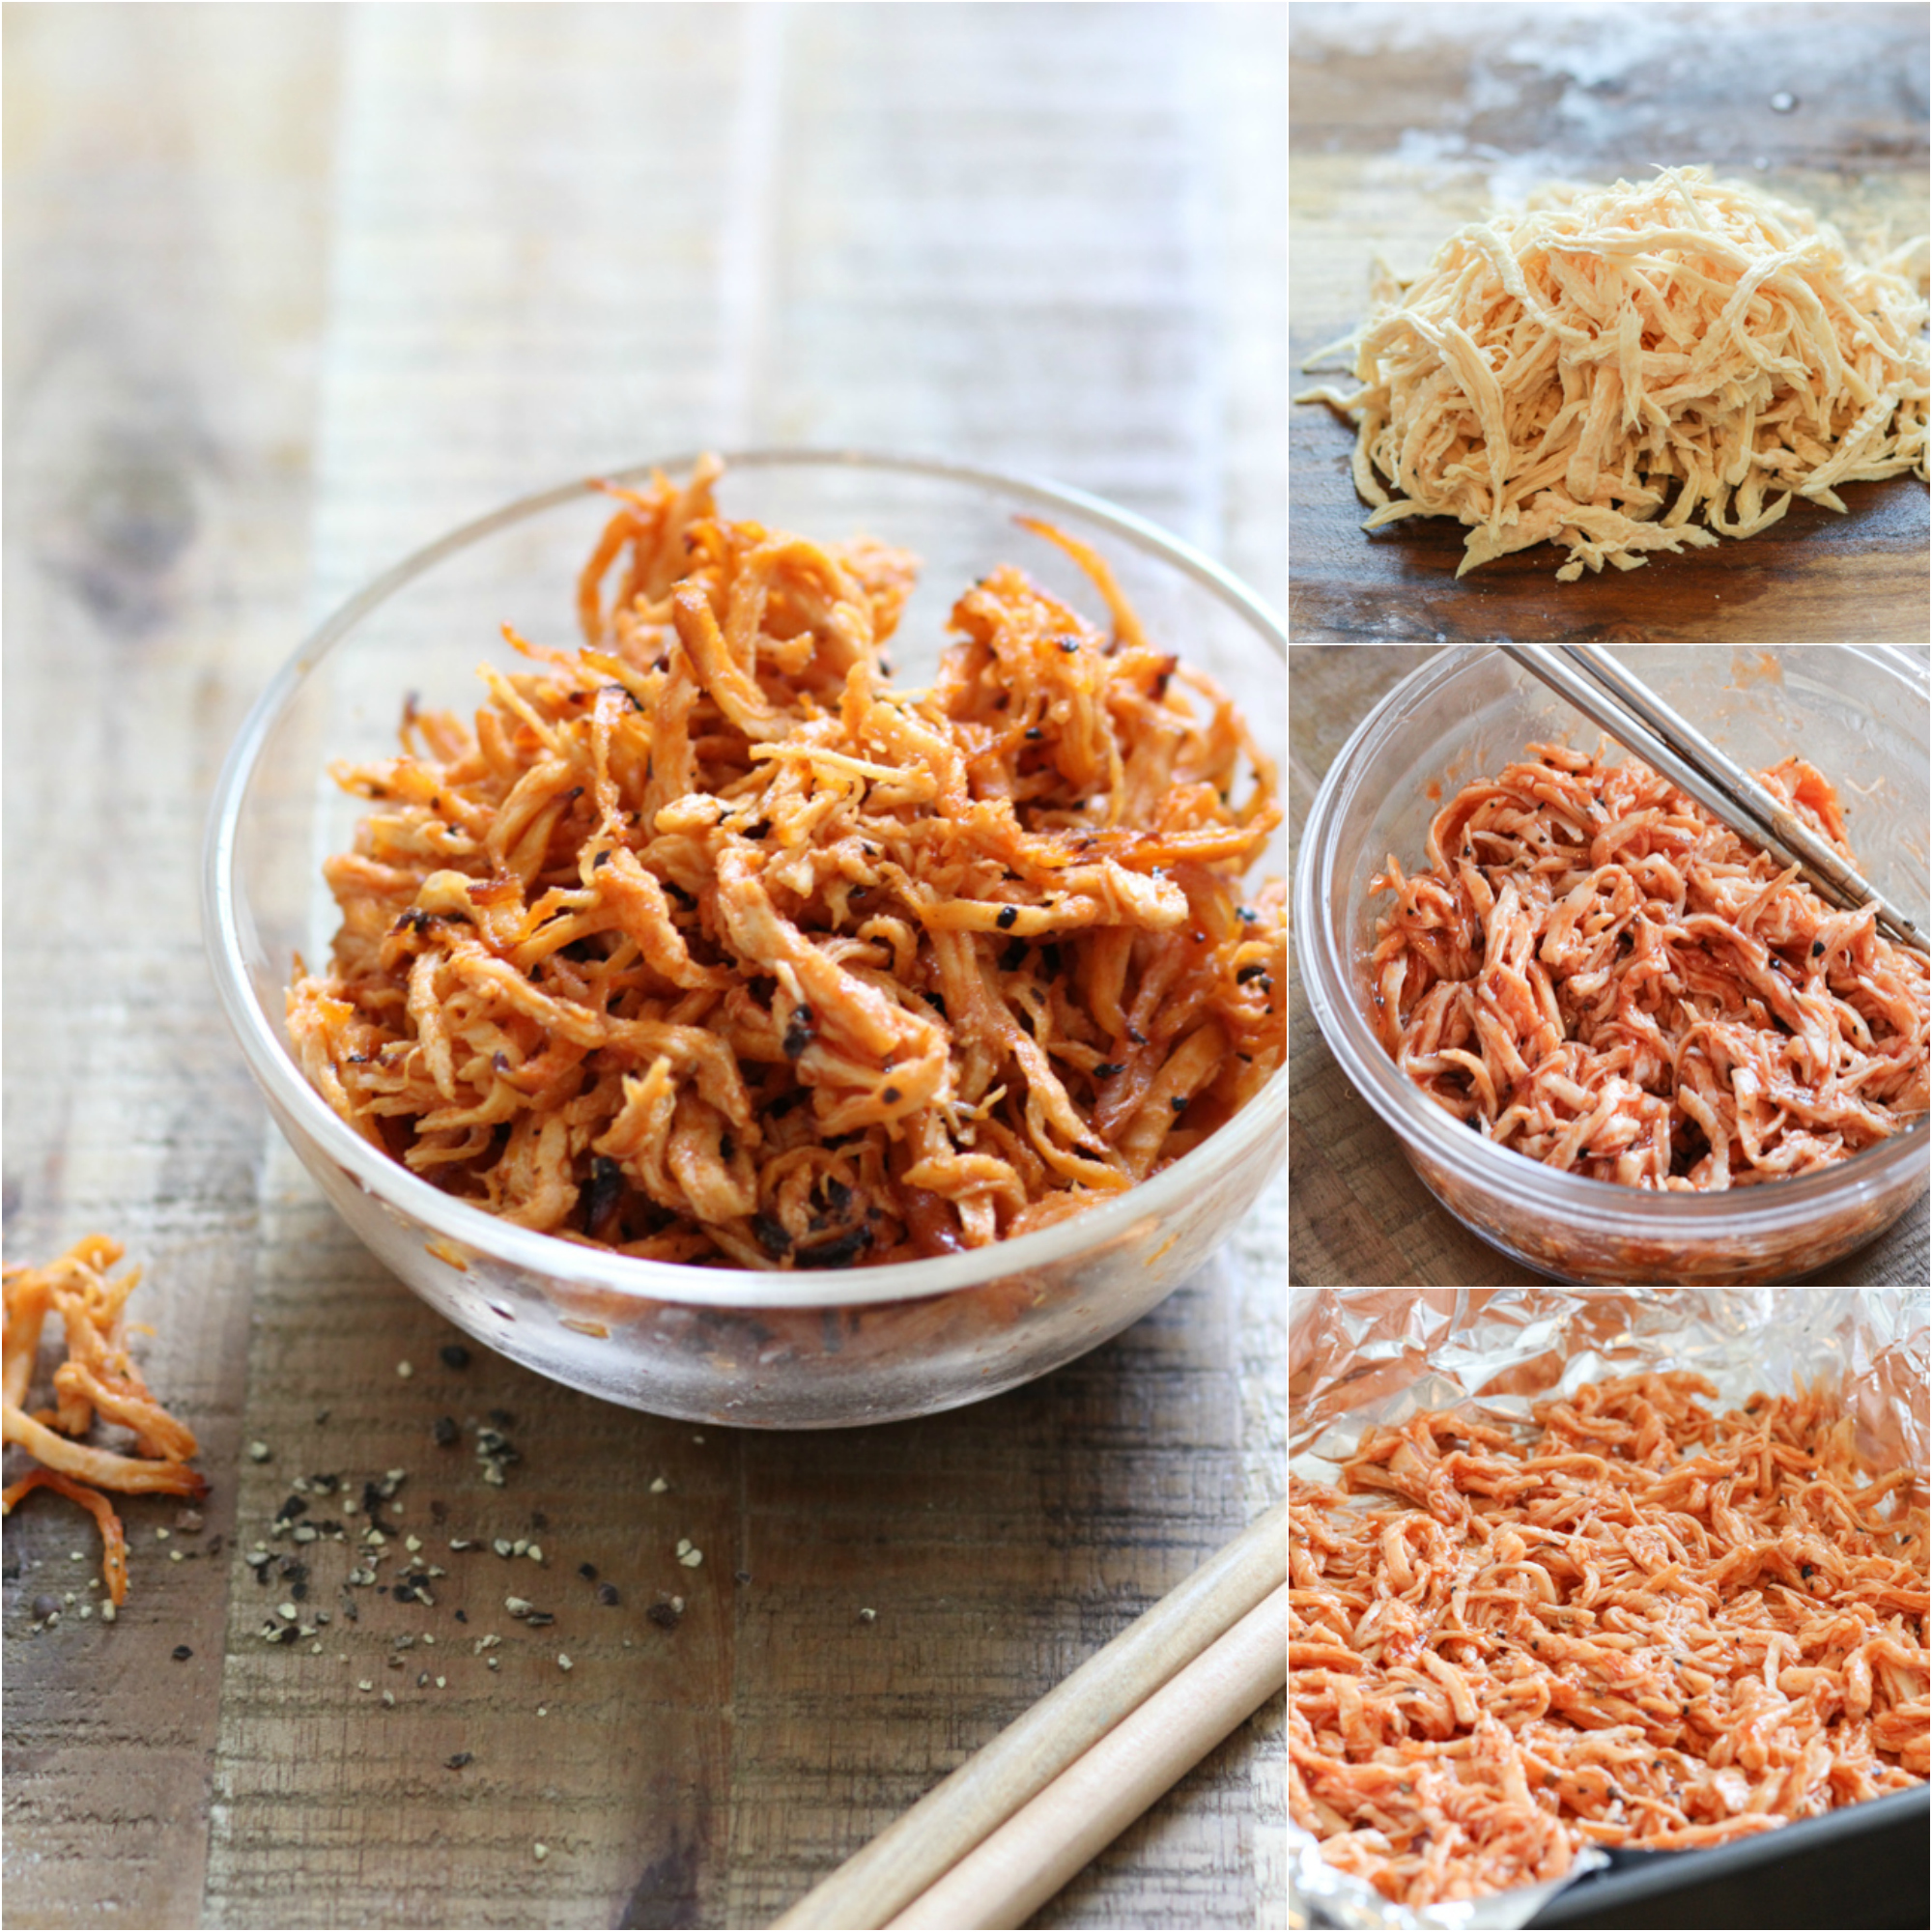 how-to-make-baked-shredded-chicken-snack